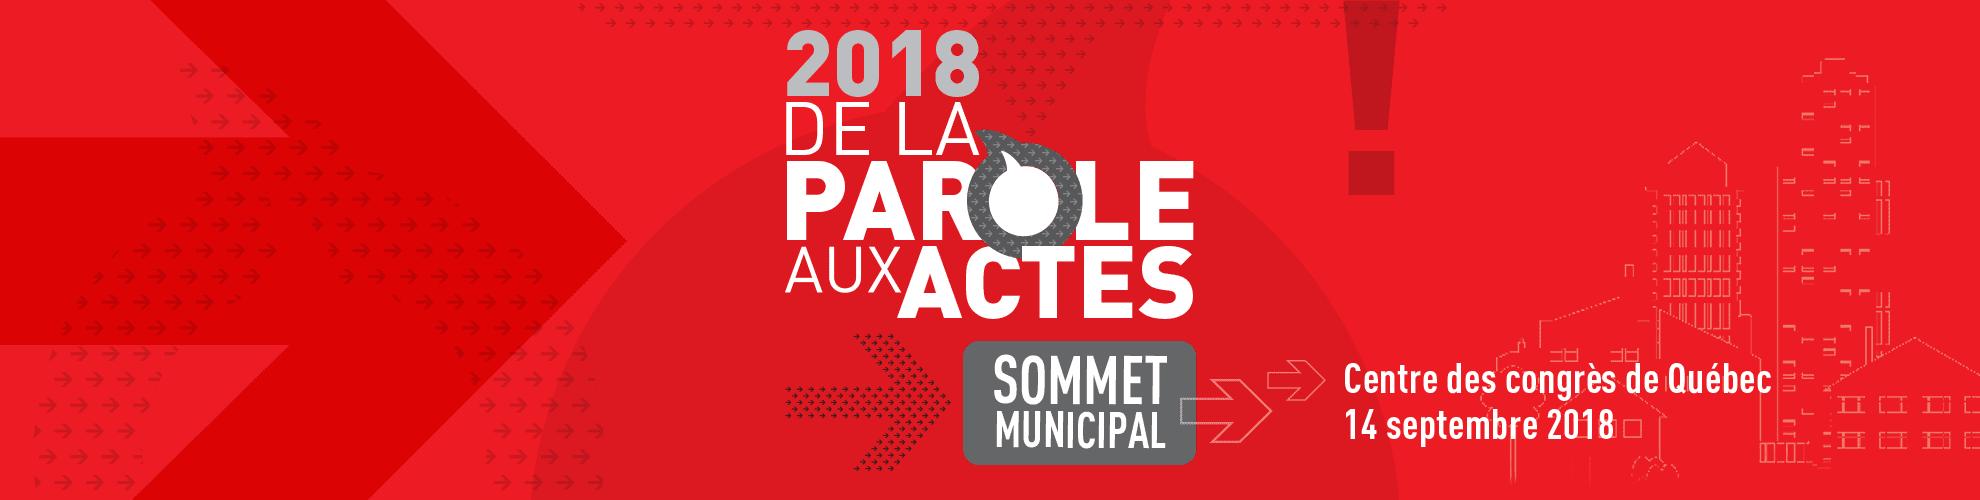 Sommet municipal 2018